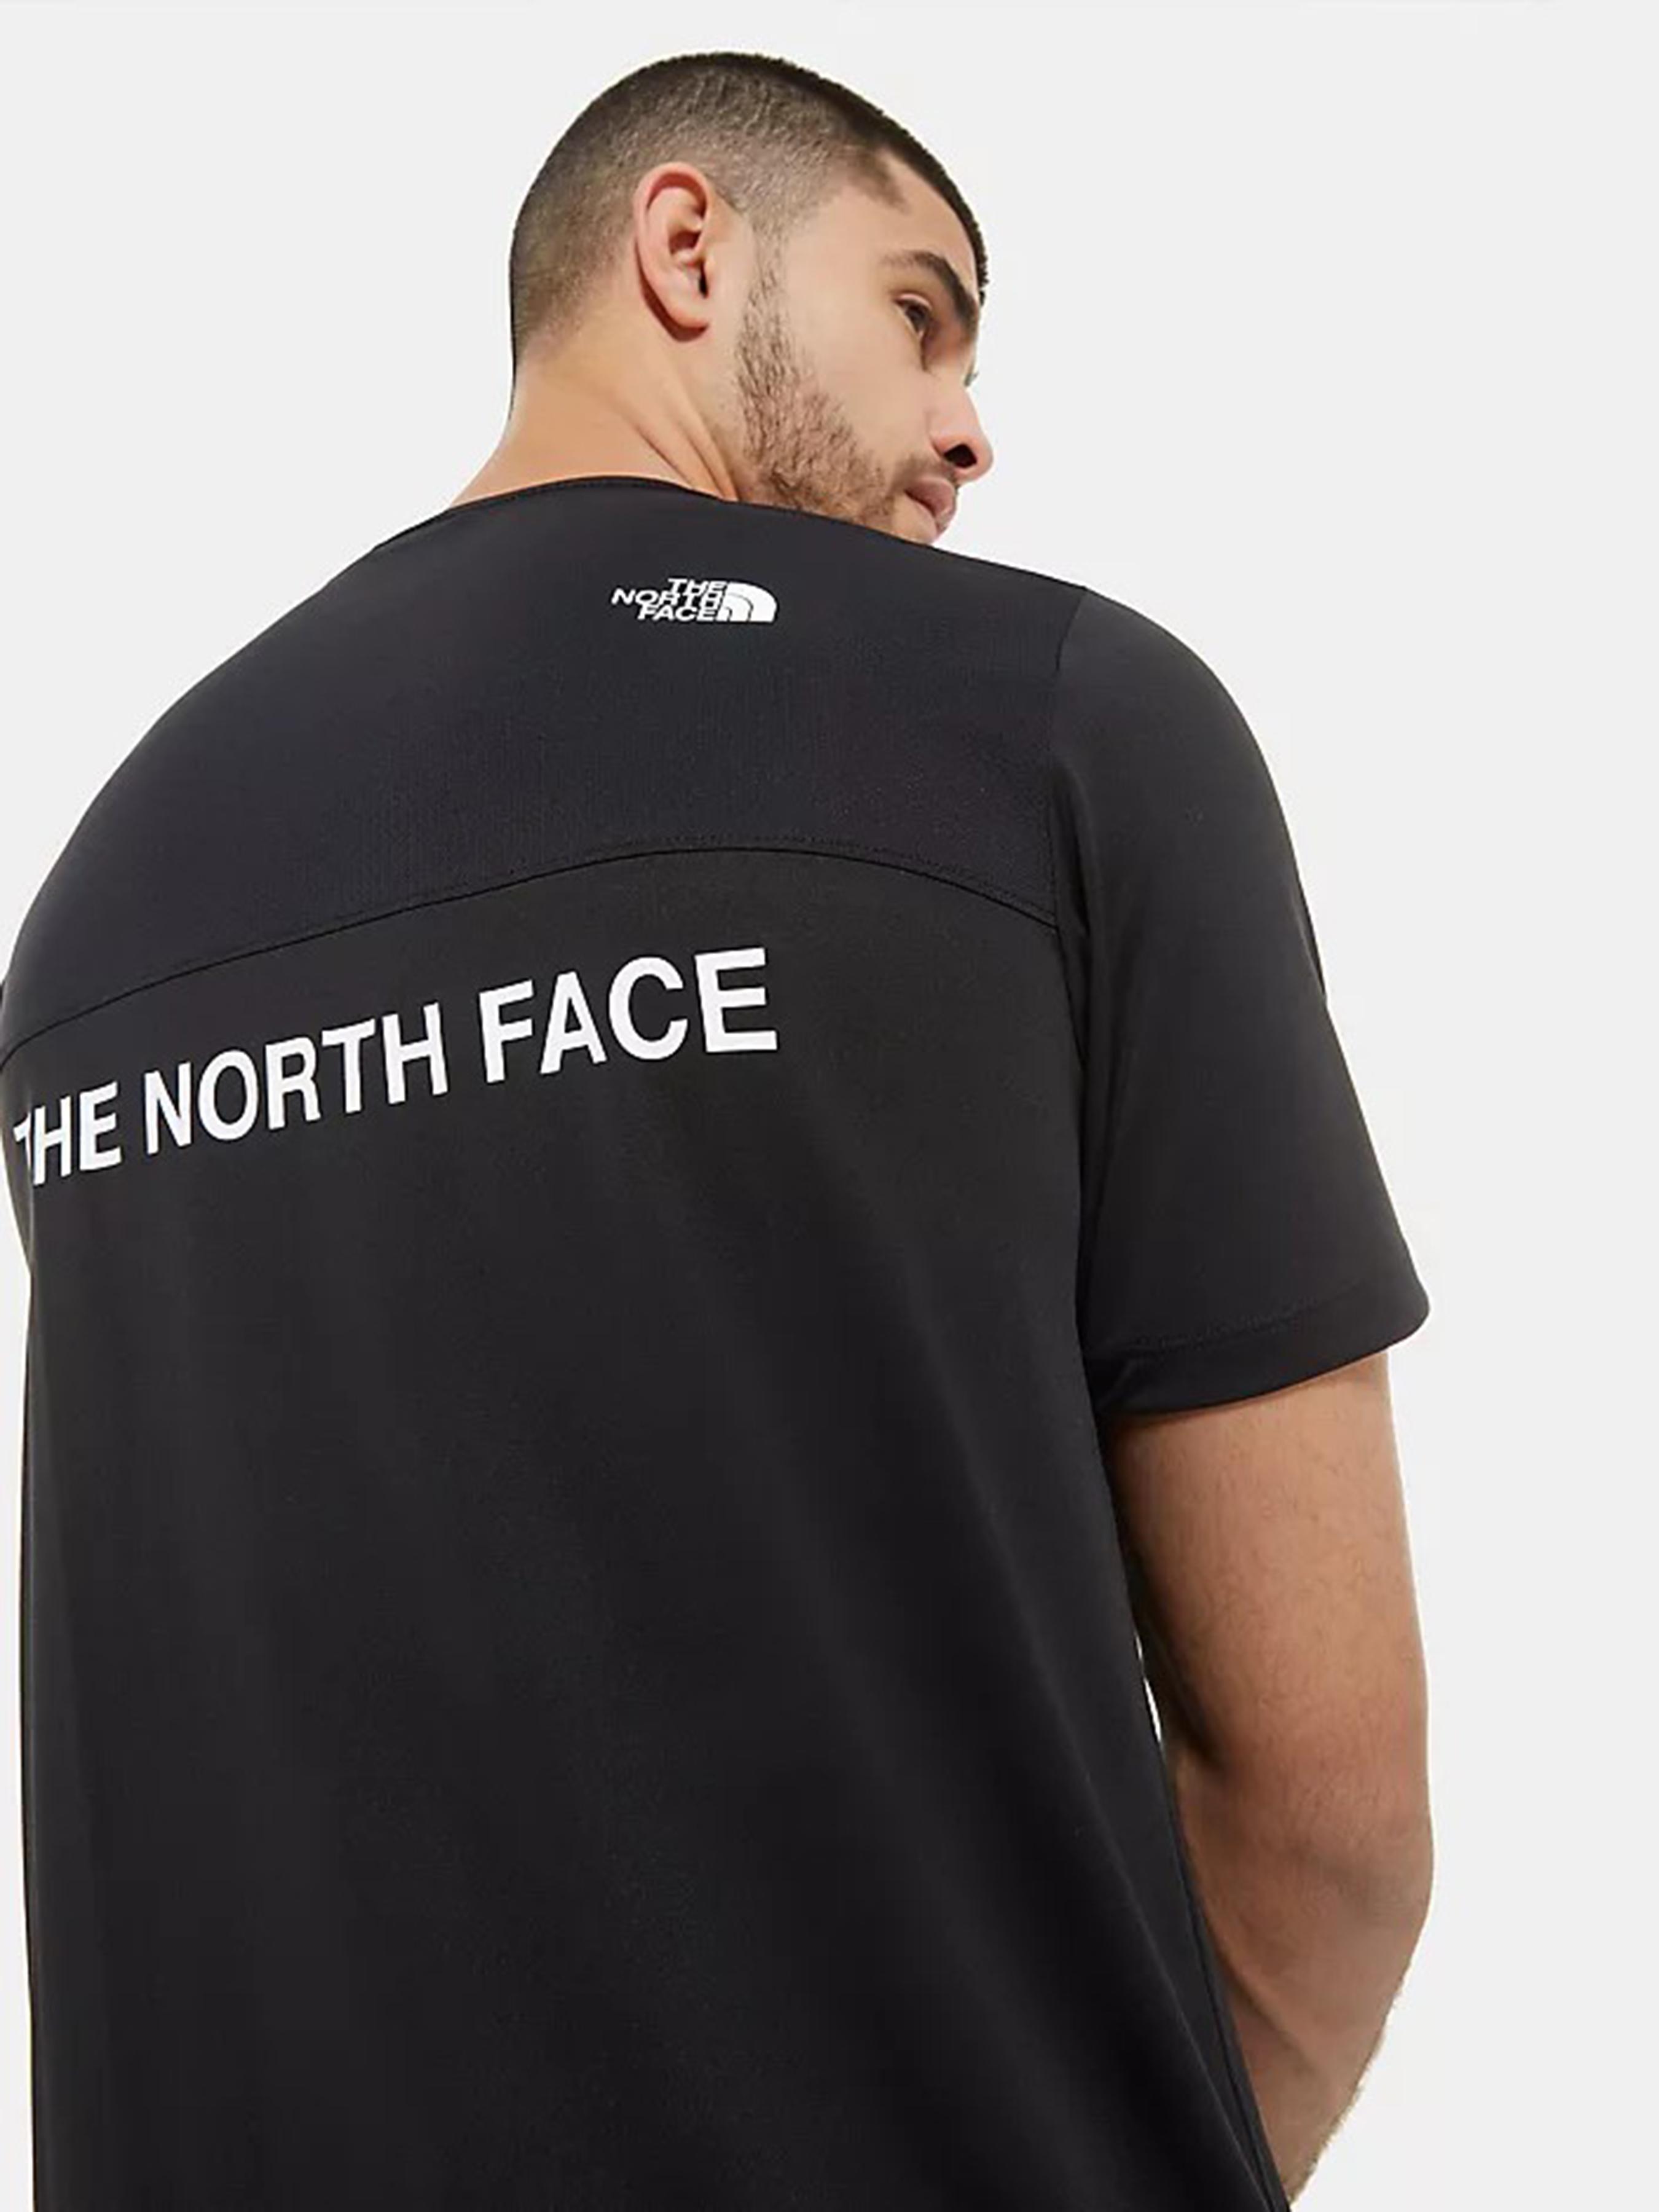 Футболка мужские The North Face модель N21288 , 2017